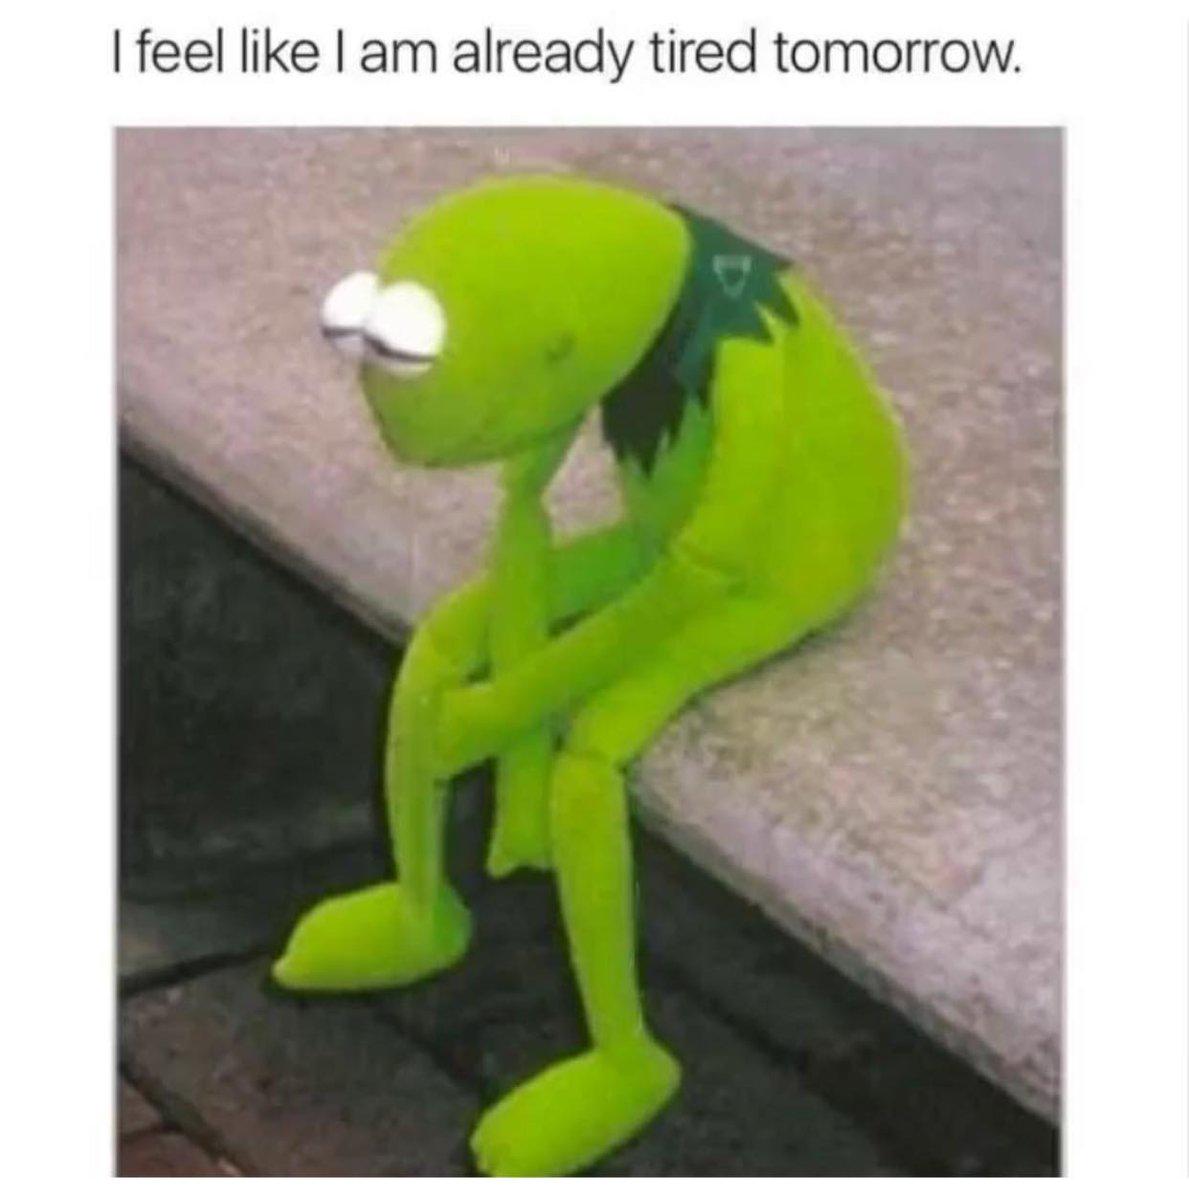 Definitely tired tomorrow